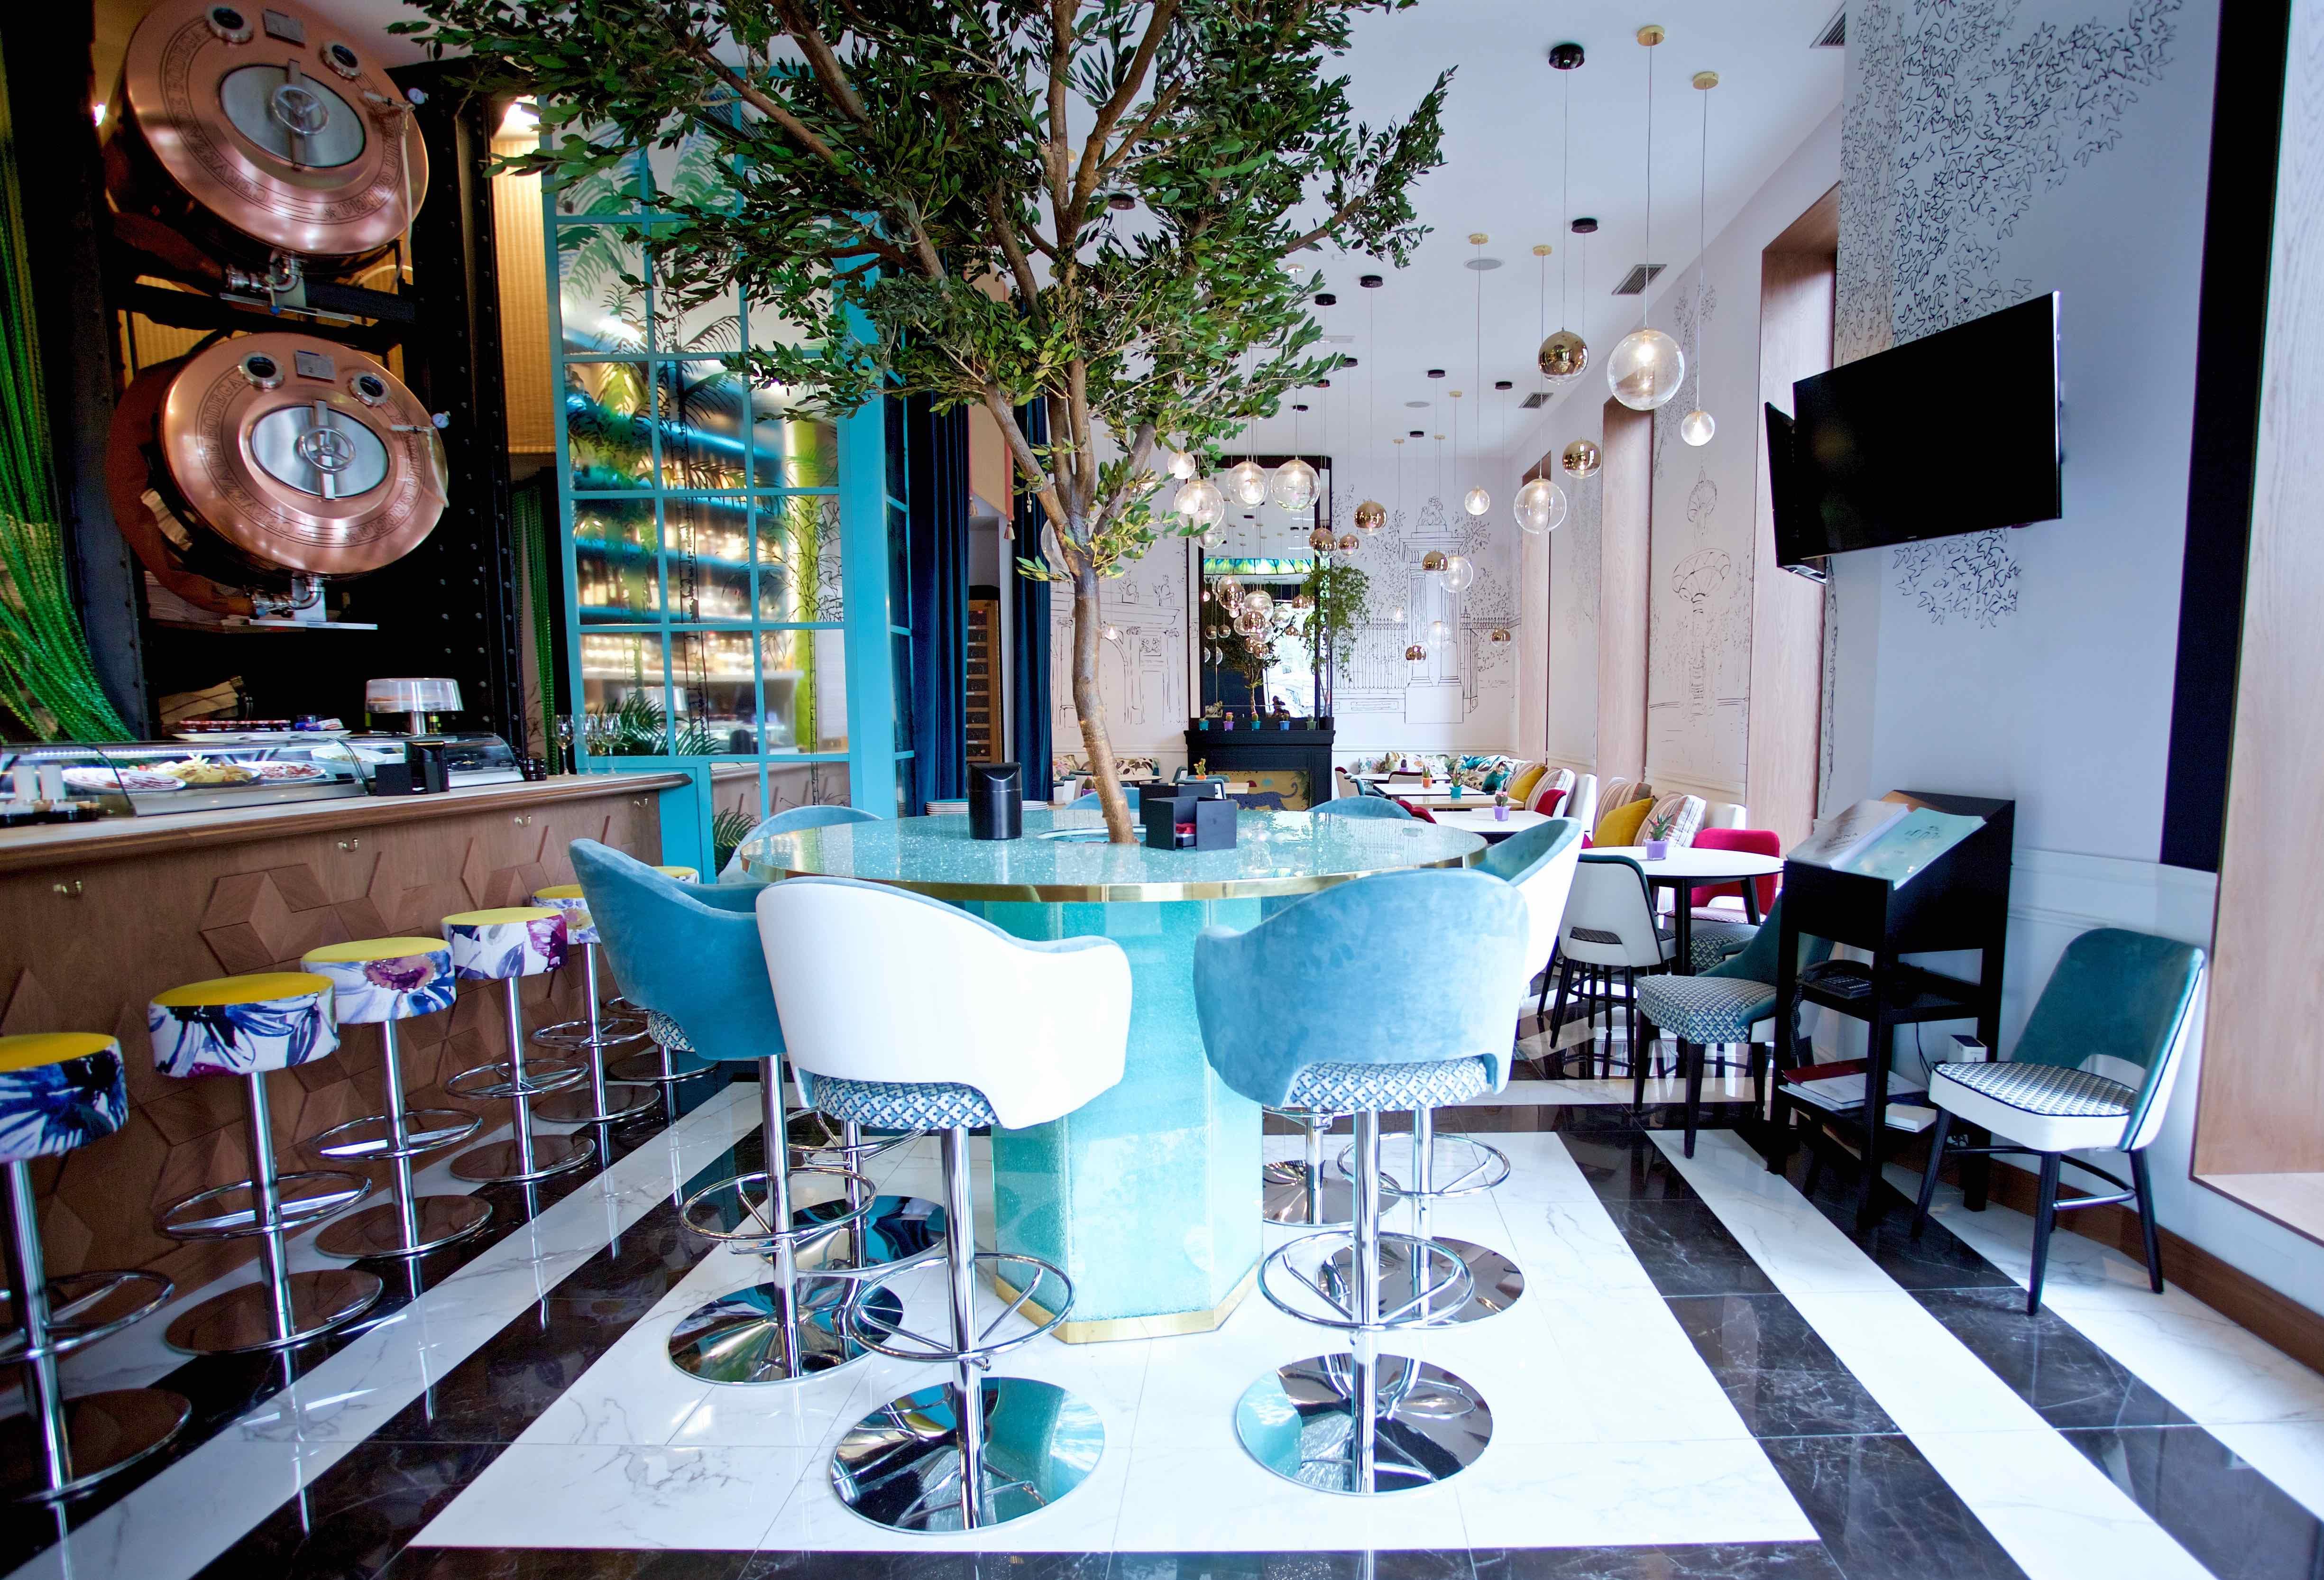 Los 13 restaurantes de madrid para salir a cenar en - Restaurantes navidad madrid ...